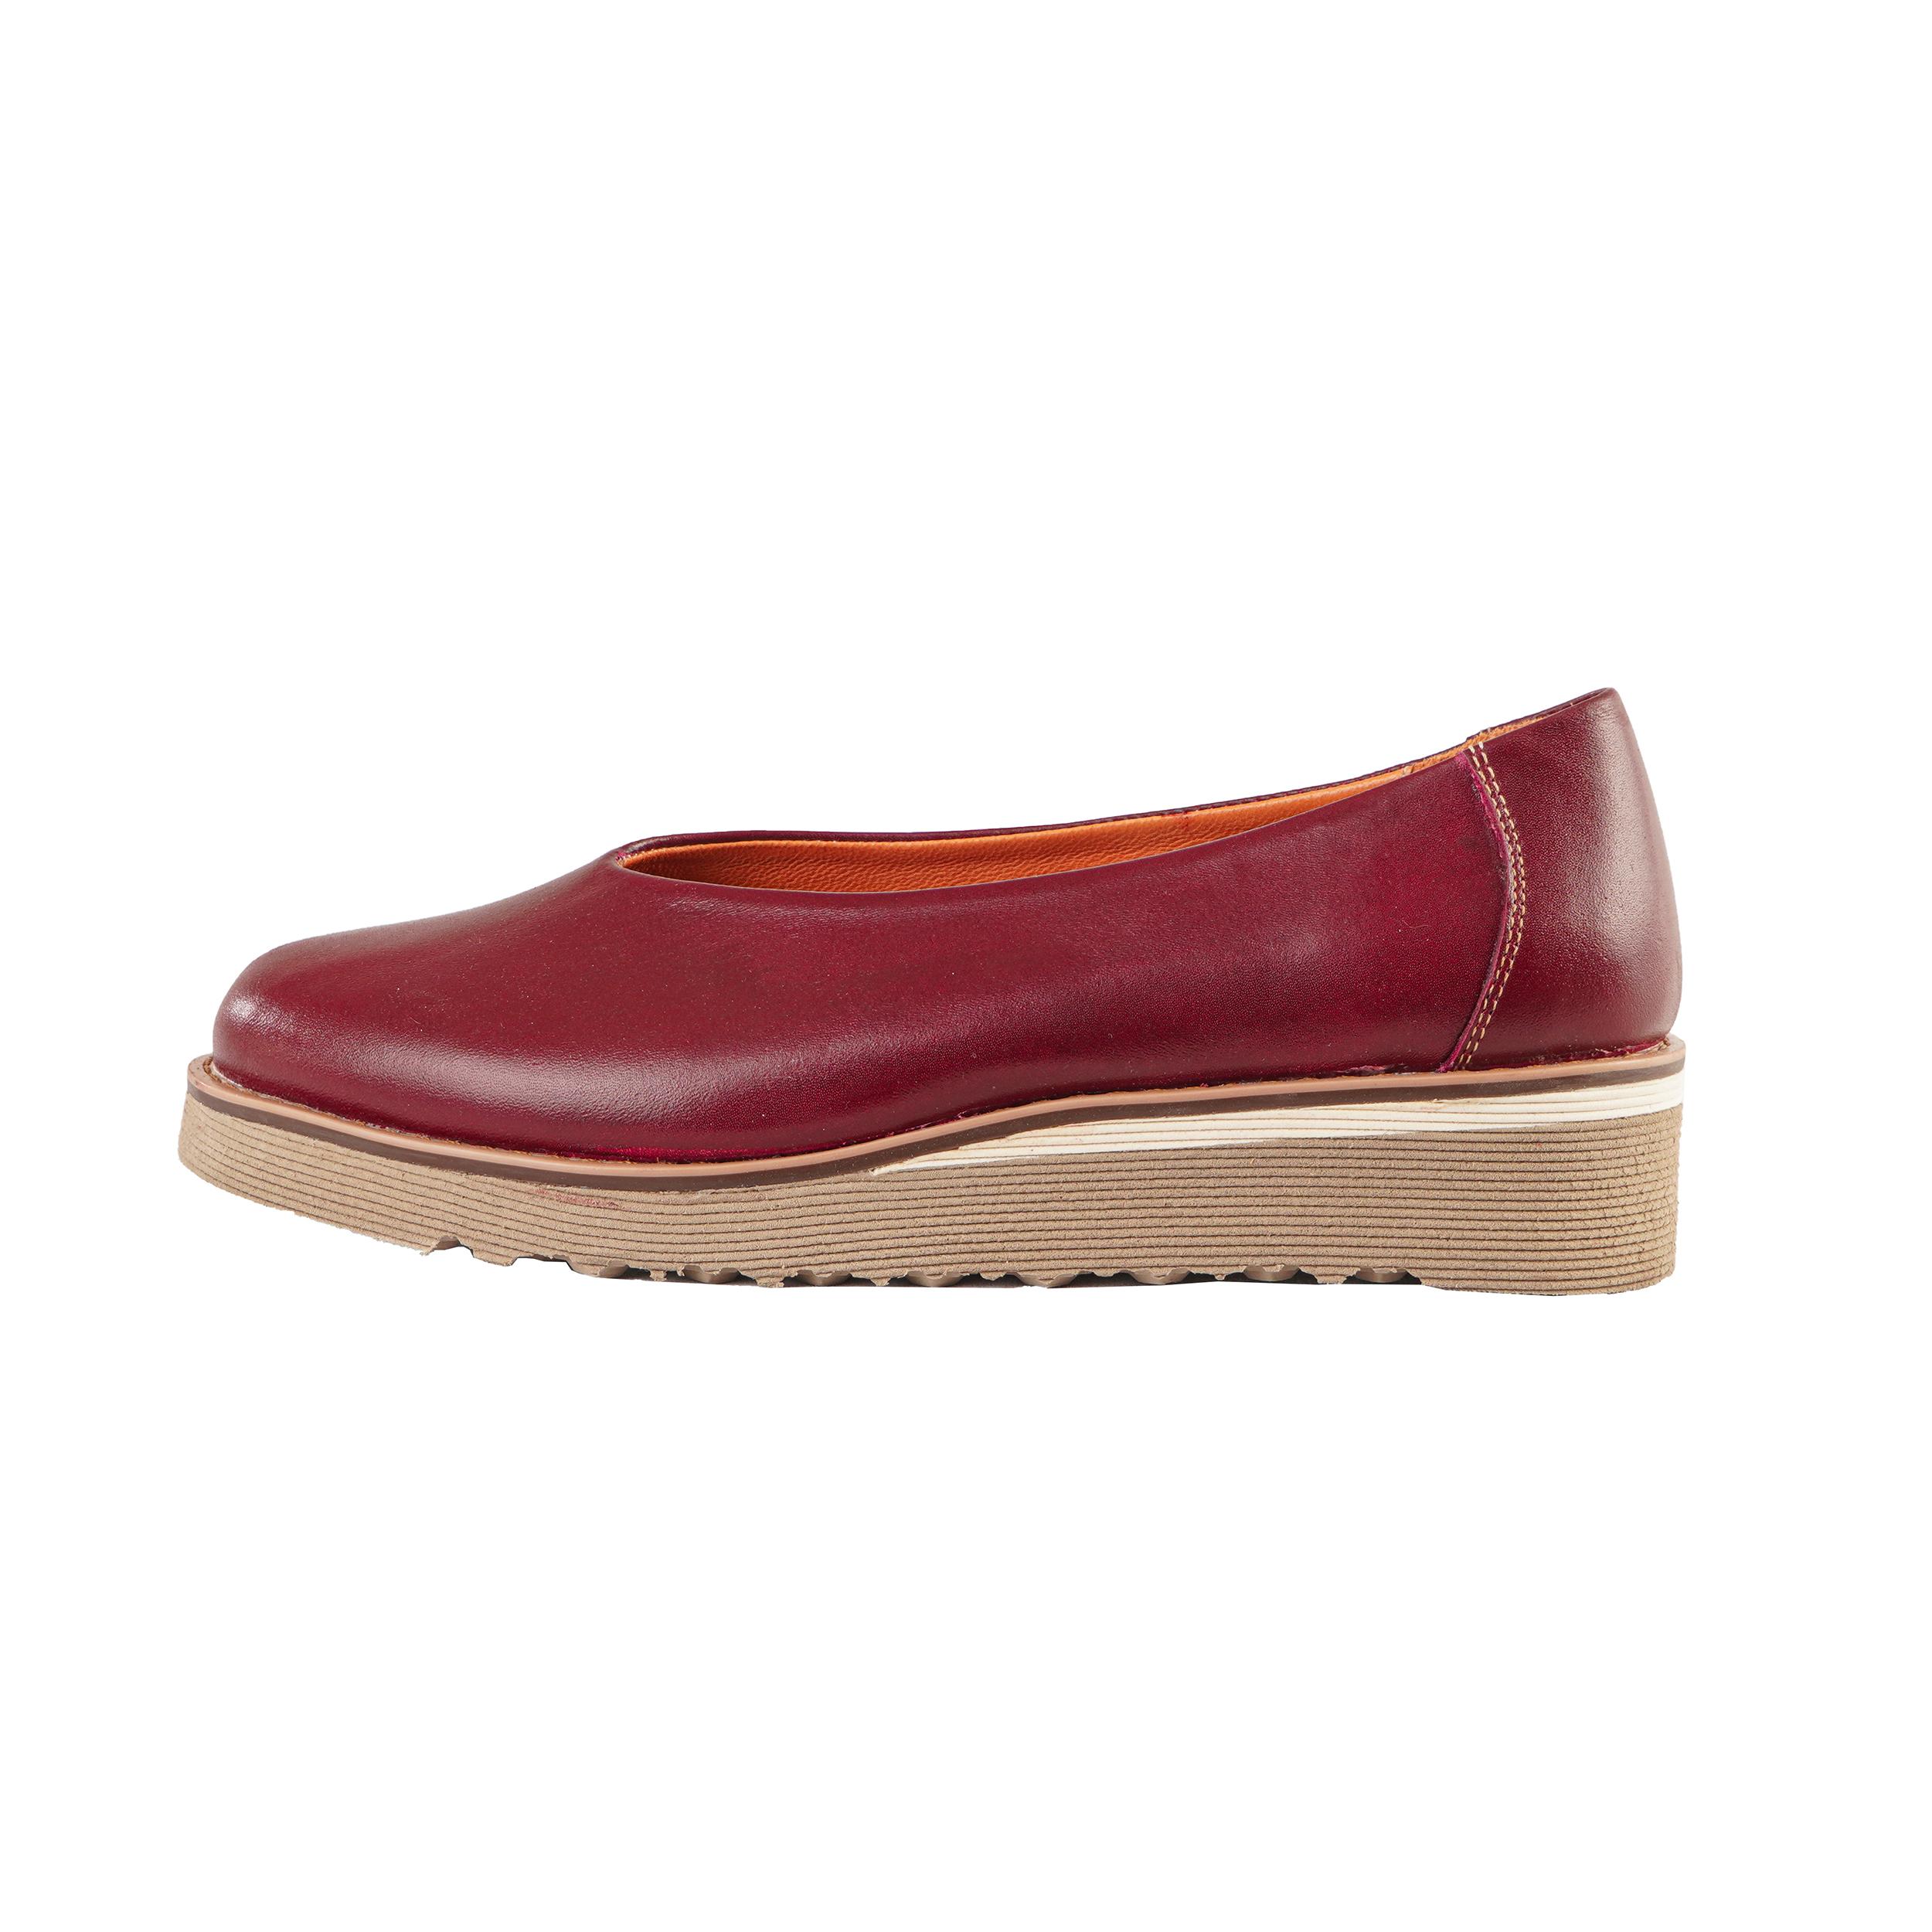 کفش روزمره زنانه صاد کد PP0902